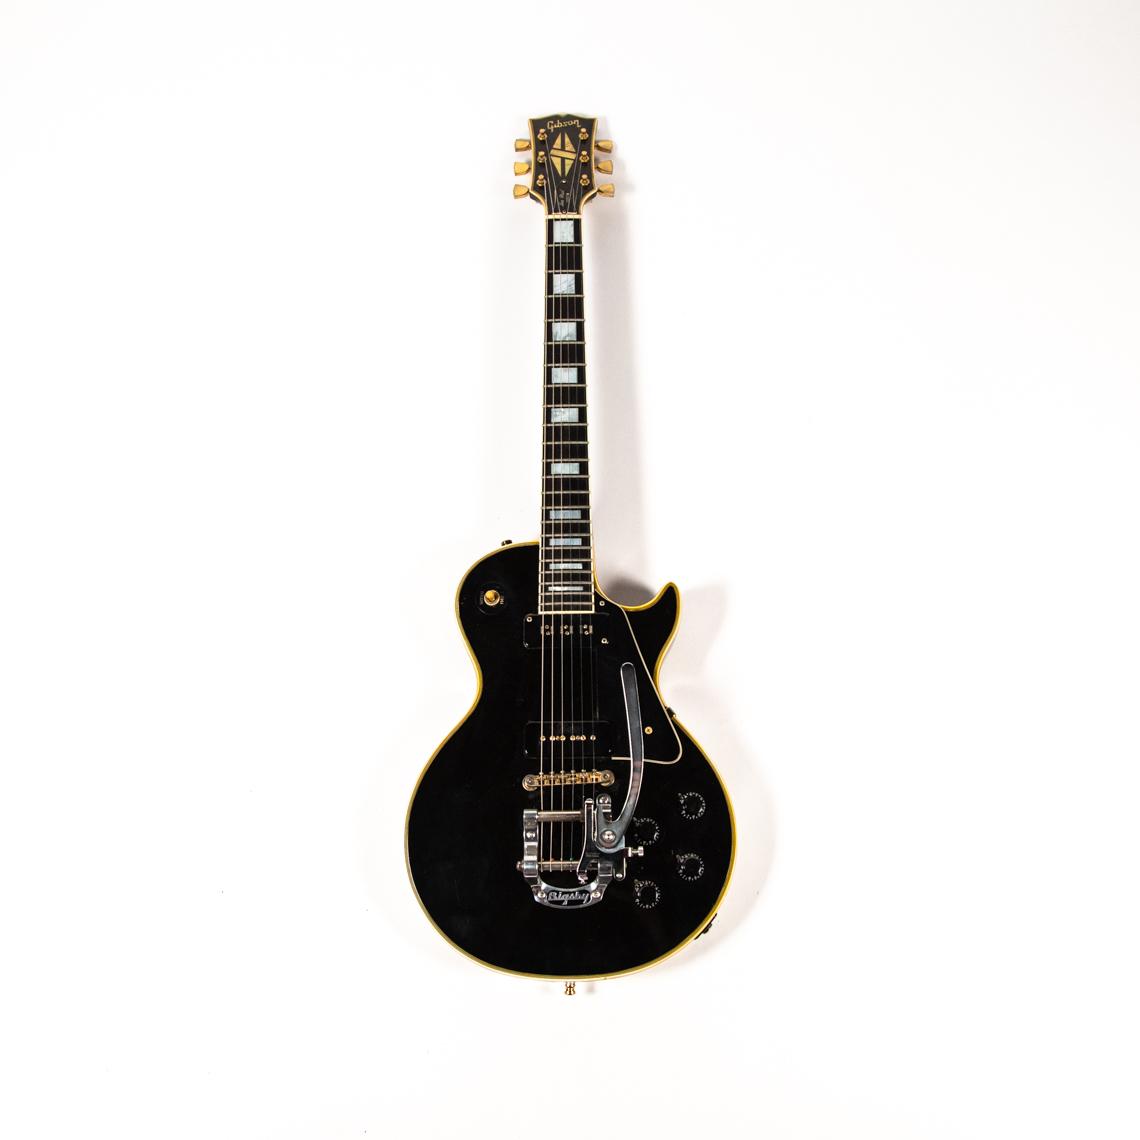 Gibson Les Paul Black Beauty '55 Reissue